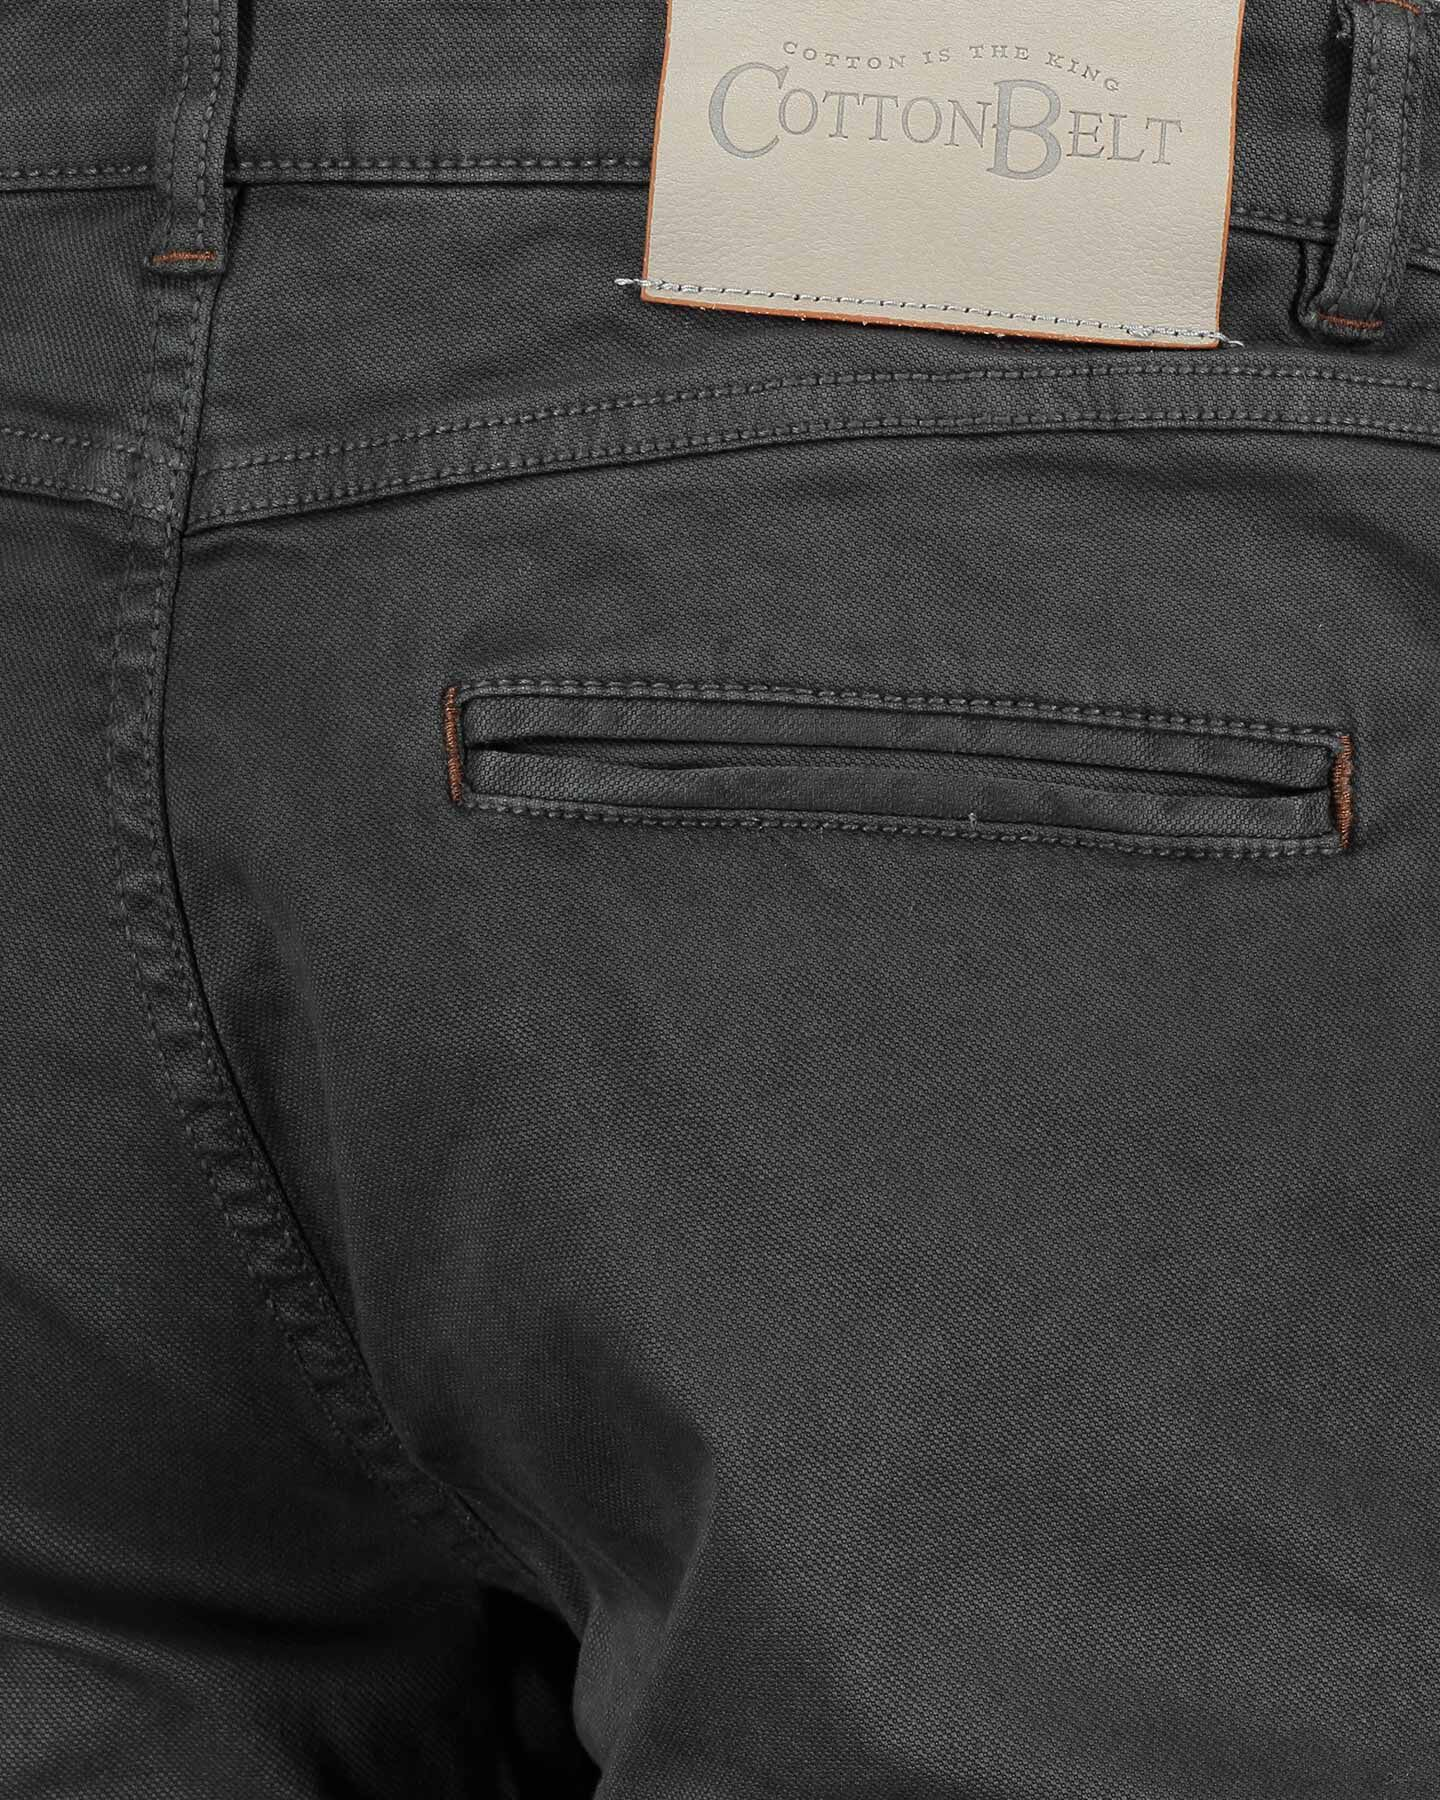 Pantalone COTTON BELT CHINO SLIM M S4081779 scatto 4